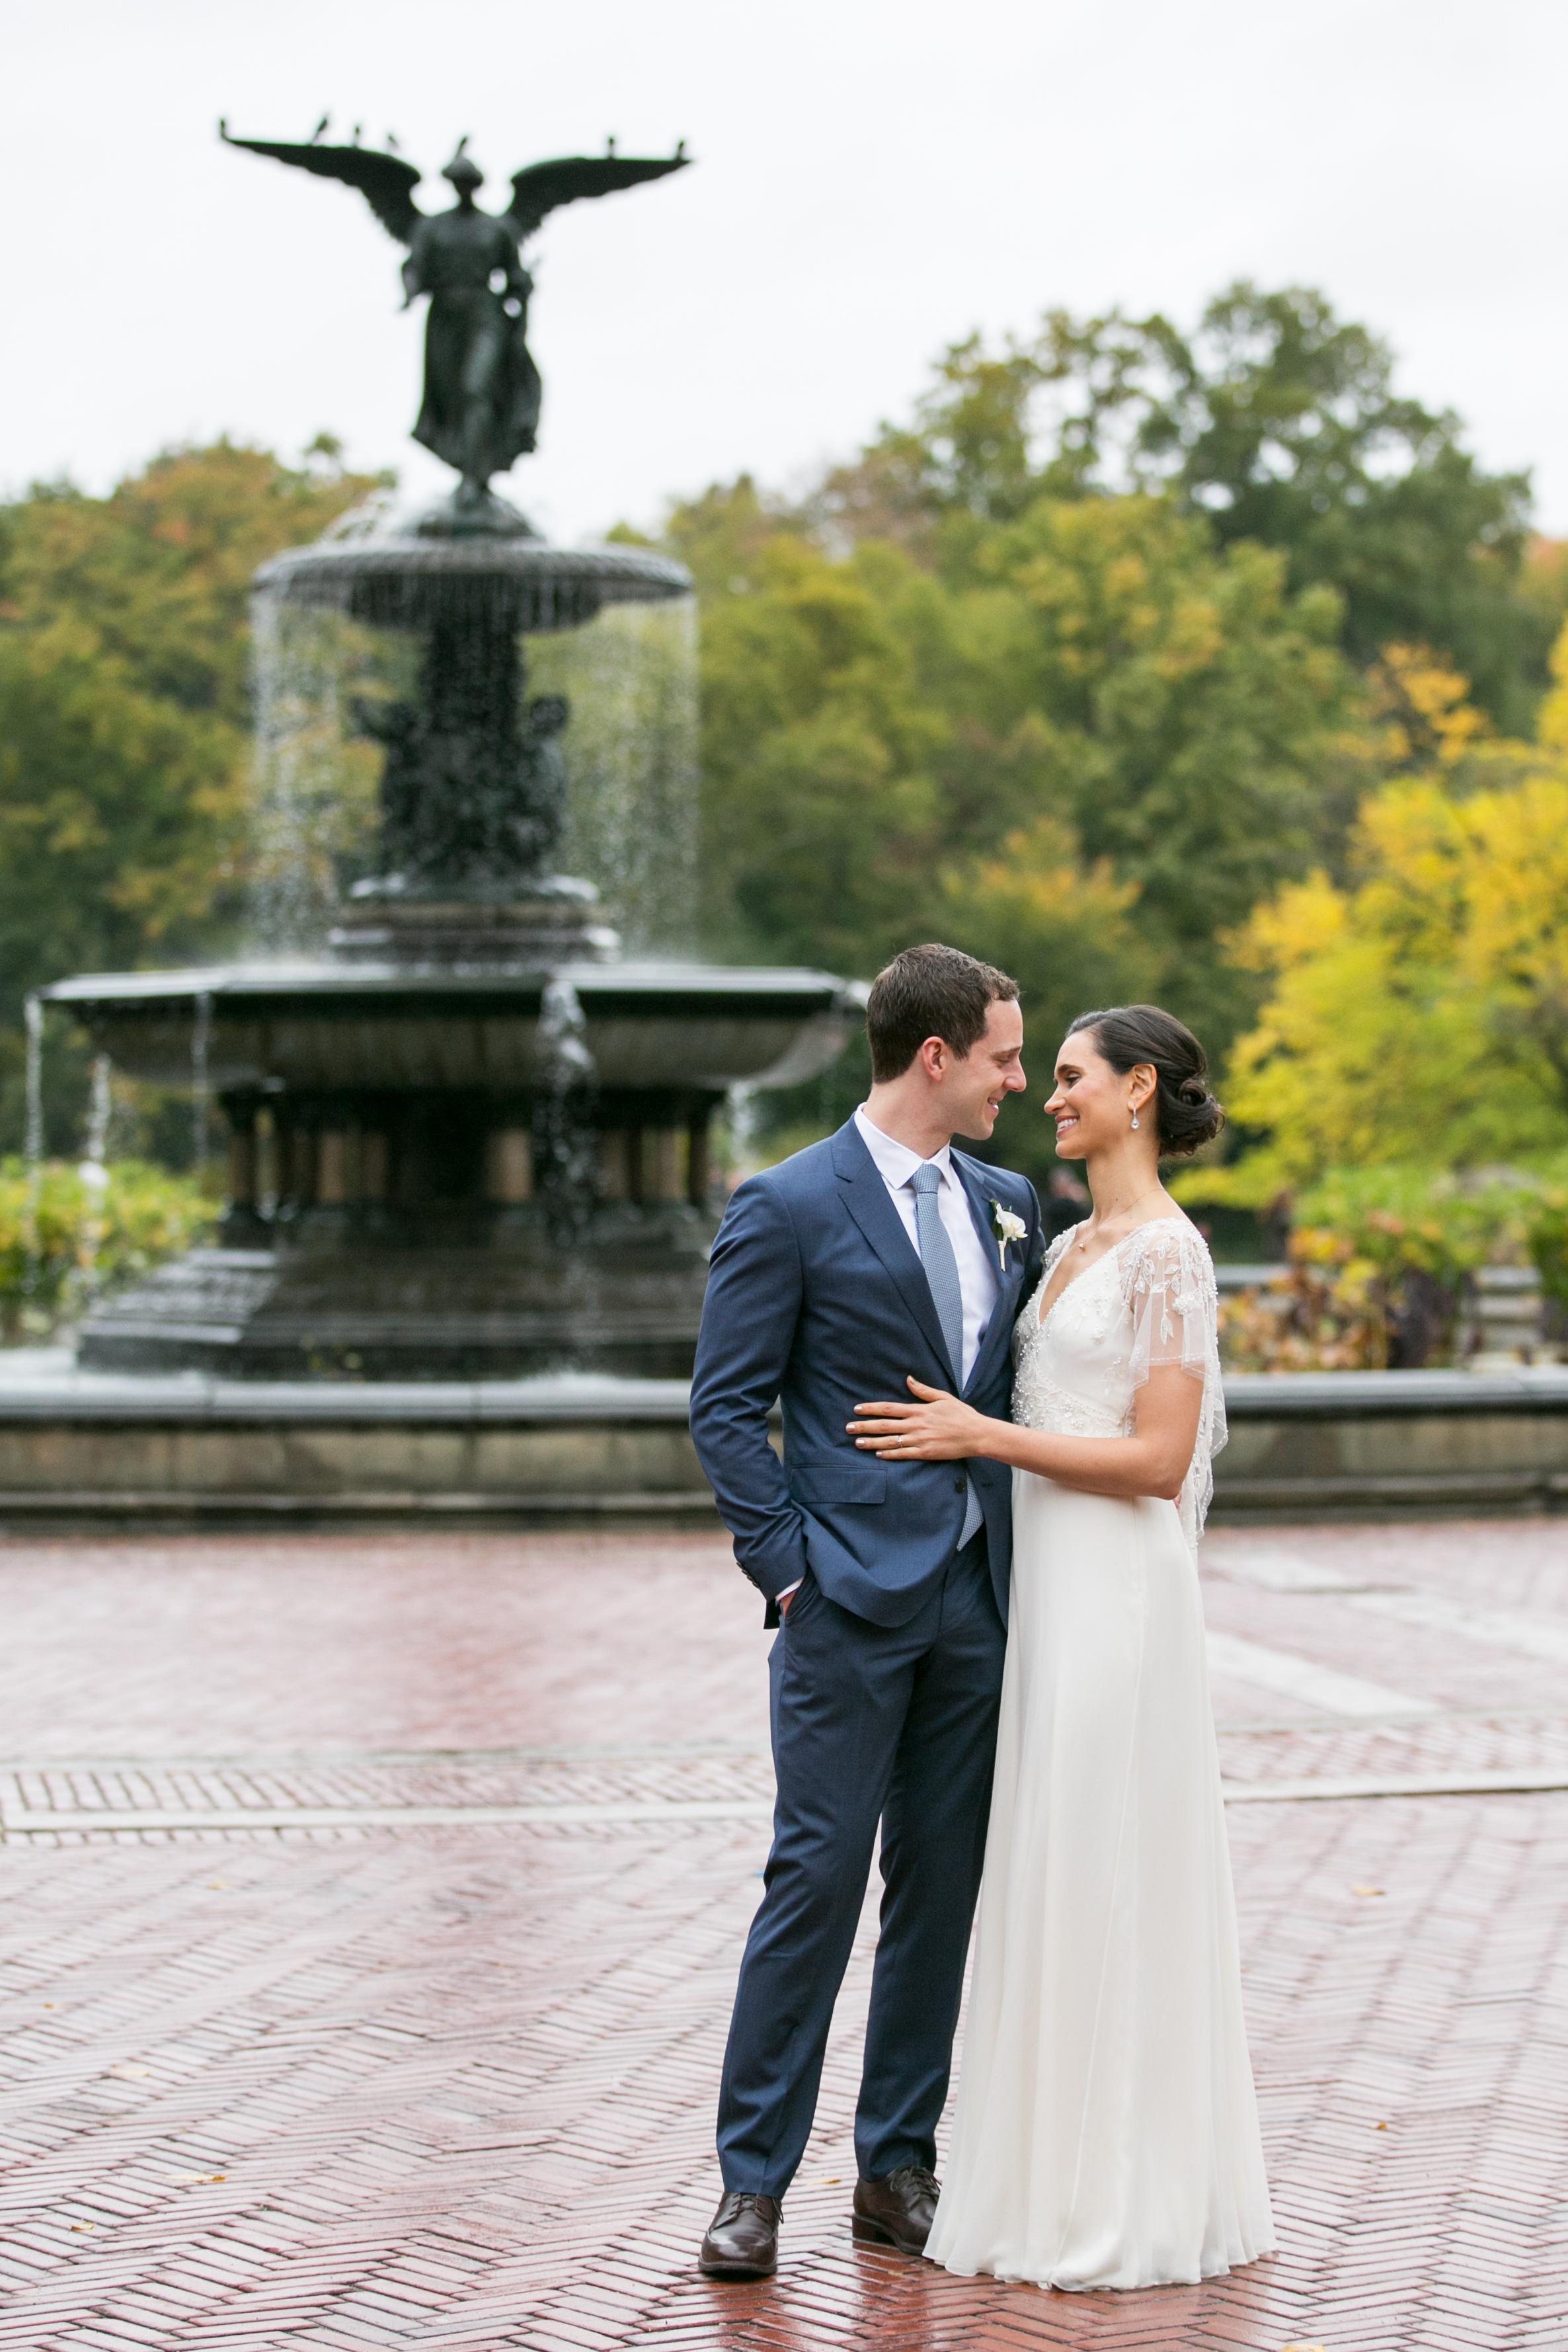 NYC-Wedding-Planner-Andrea-Freeman-Events-Leob-Boathouse-Central-Park-7.jpg